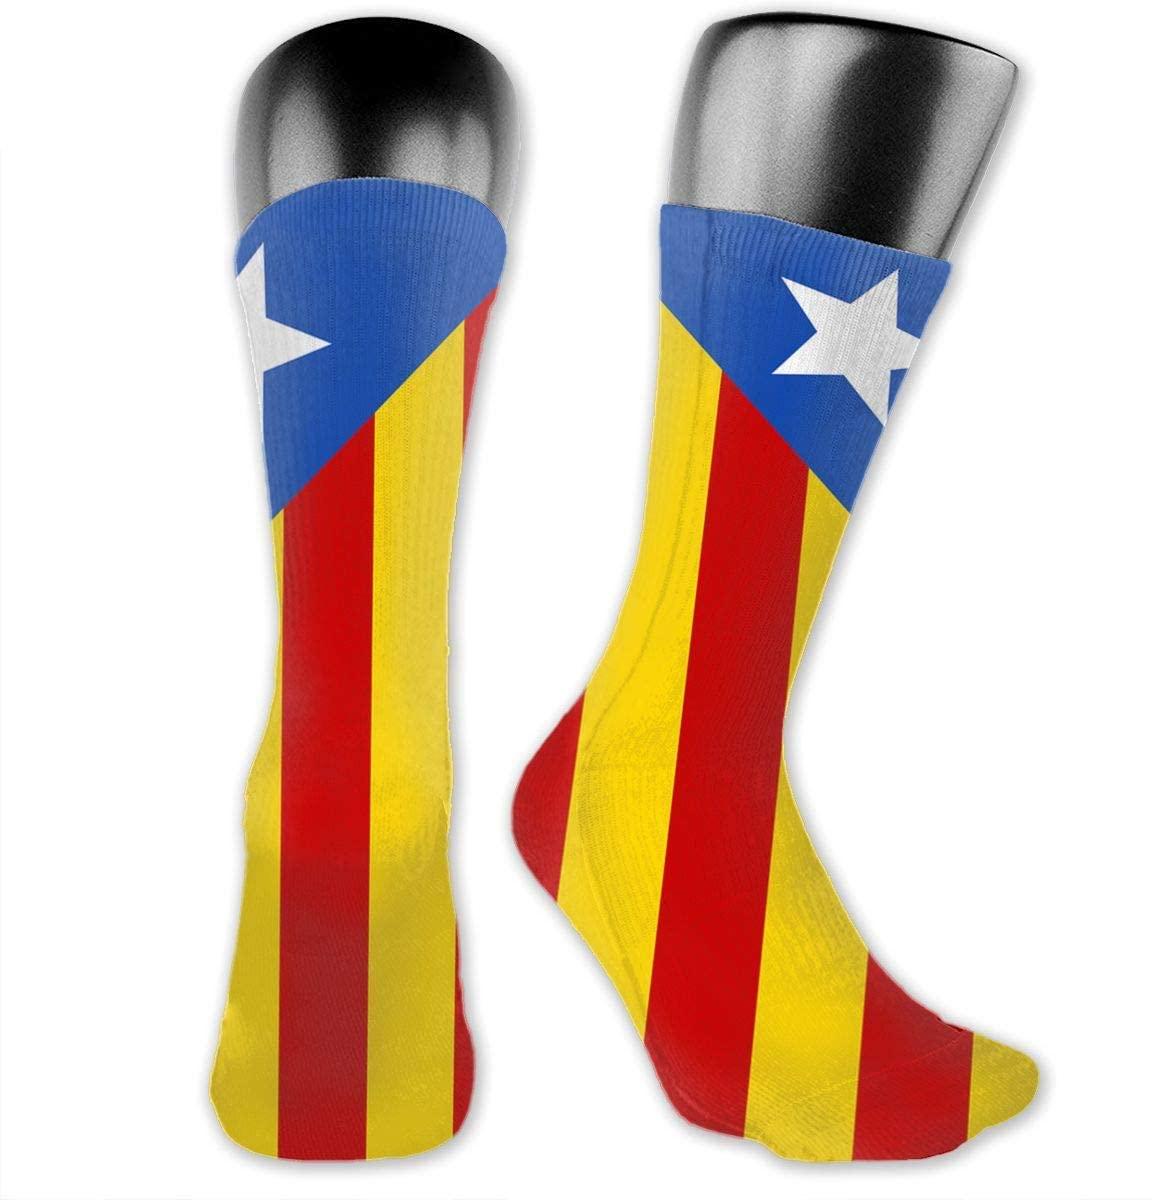 Catalonia Flag Unisex Outdoor Long Socks Sport Athletic Crew Socks Stockings